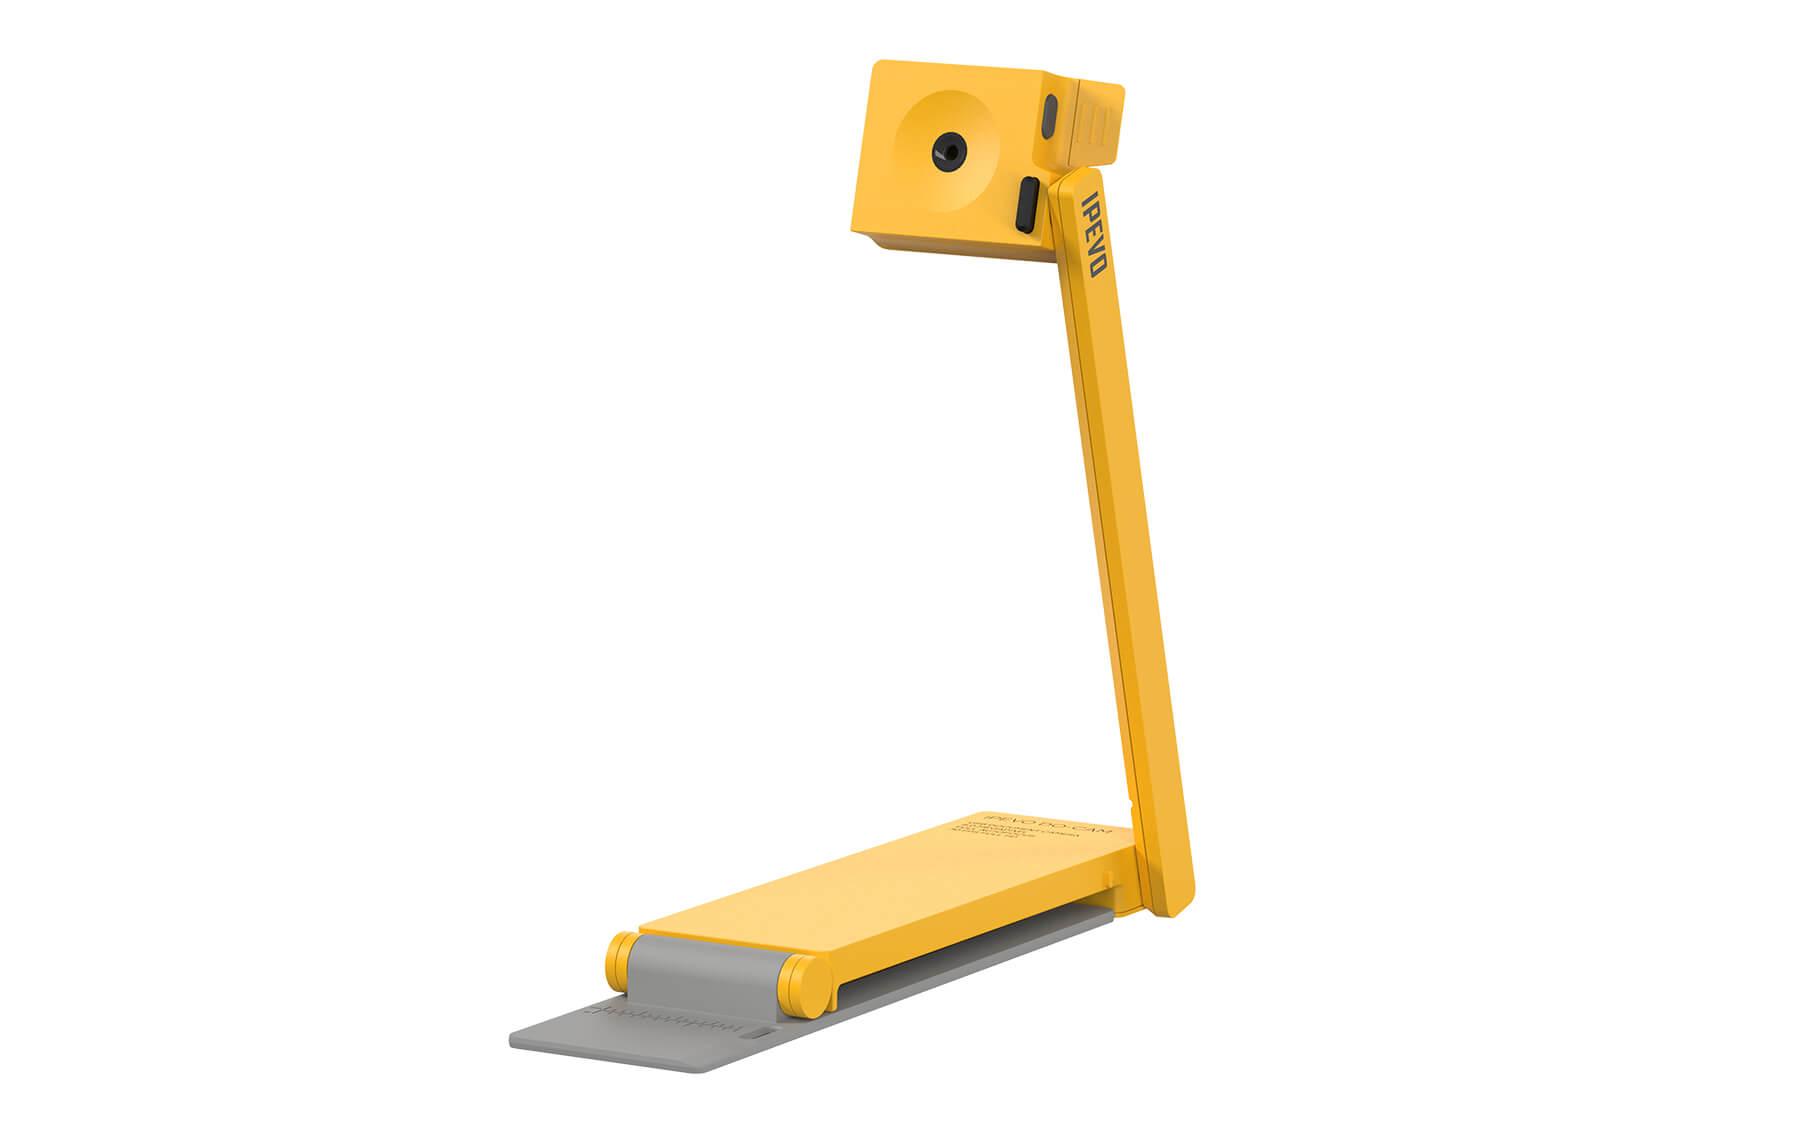 IPEVO DO-CAM Creator's Edition USB Visualiser Gallery photo 2